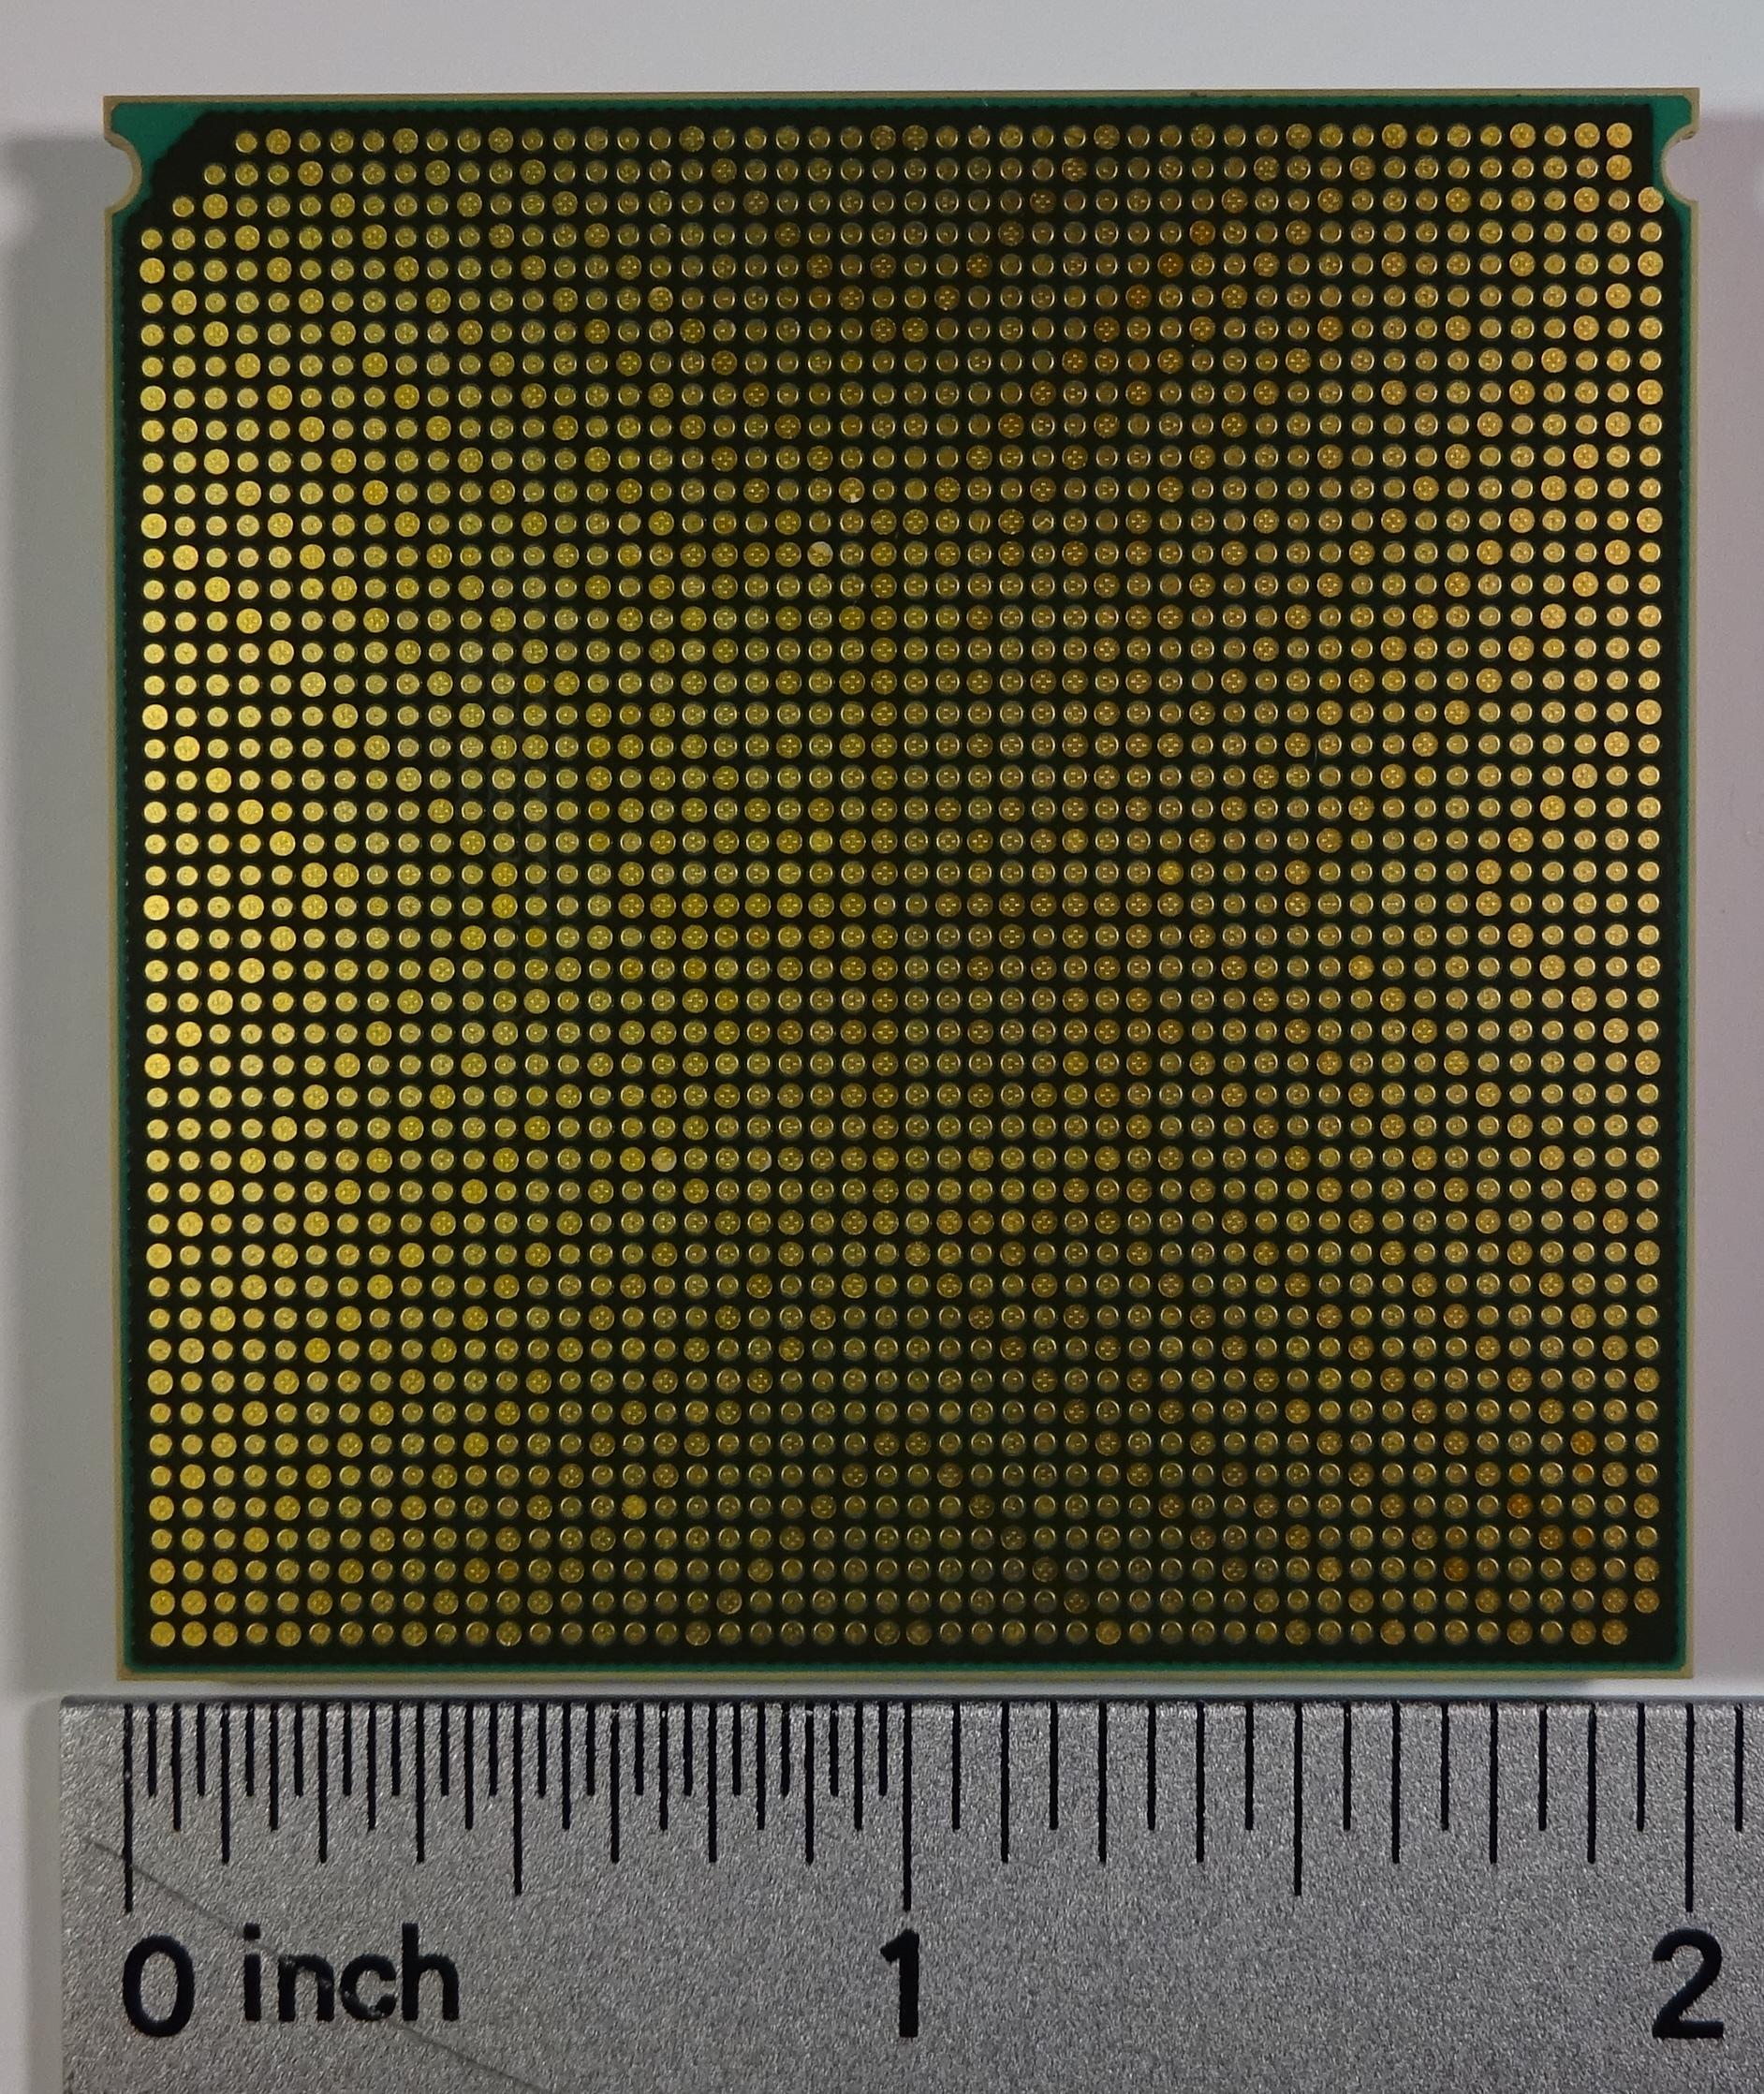 ibm power6 microprocessor 64 bit